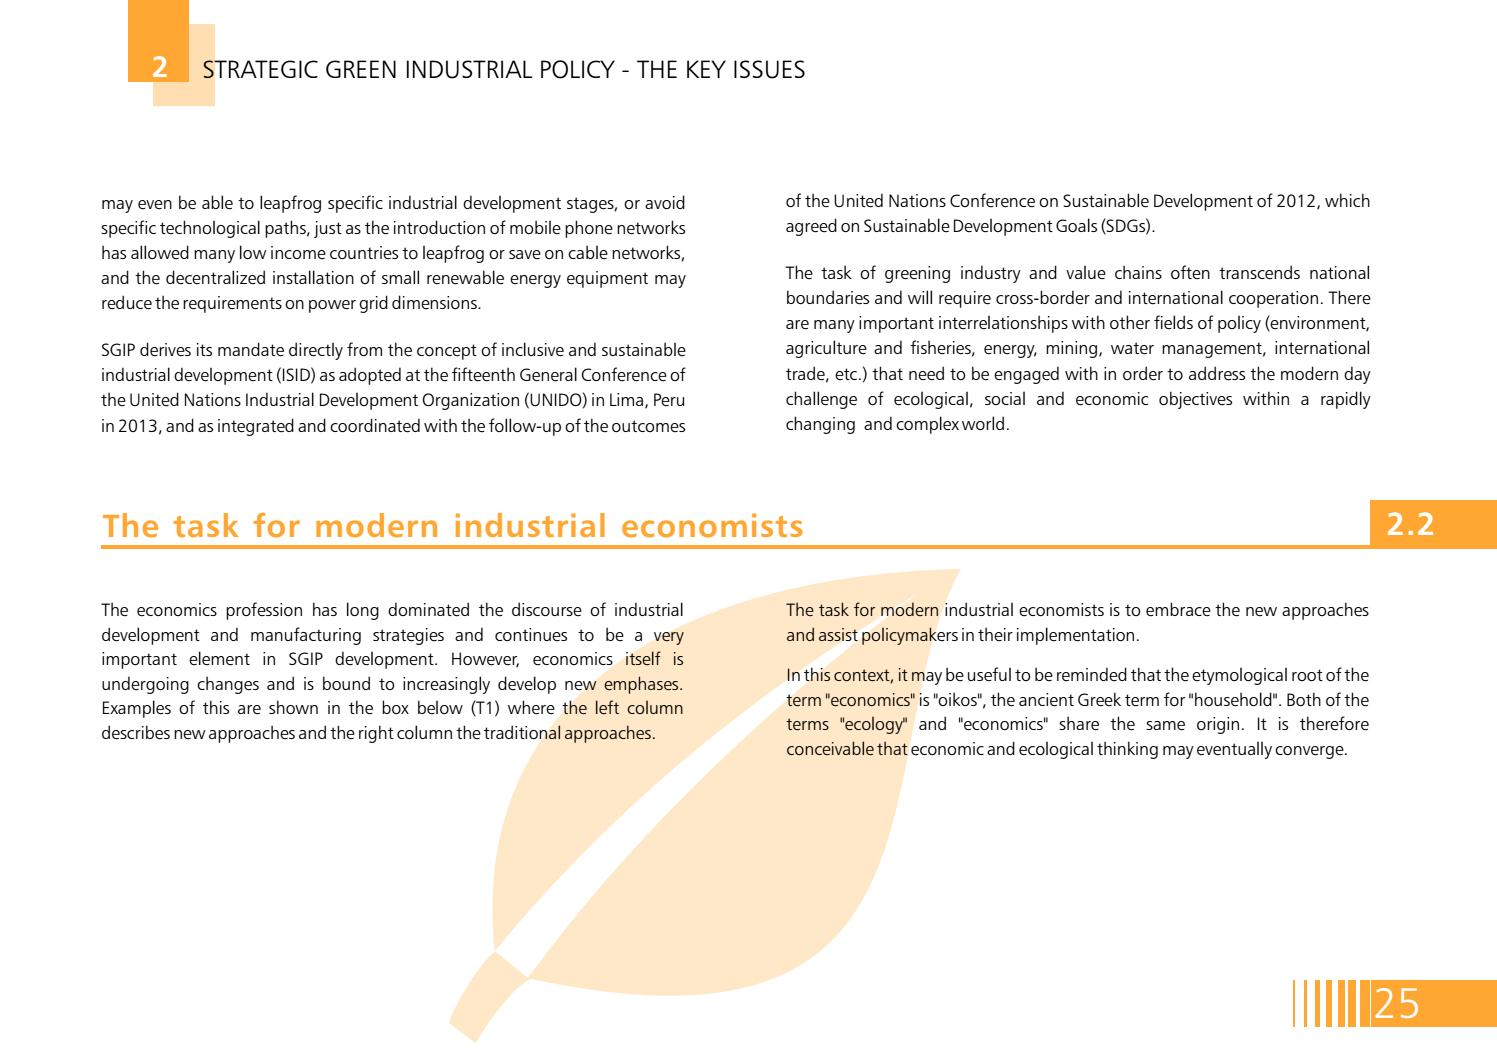 GENERAL AND INDUSTRIAL ECONOMICS EPUB